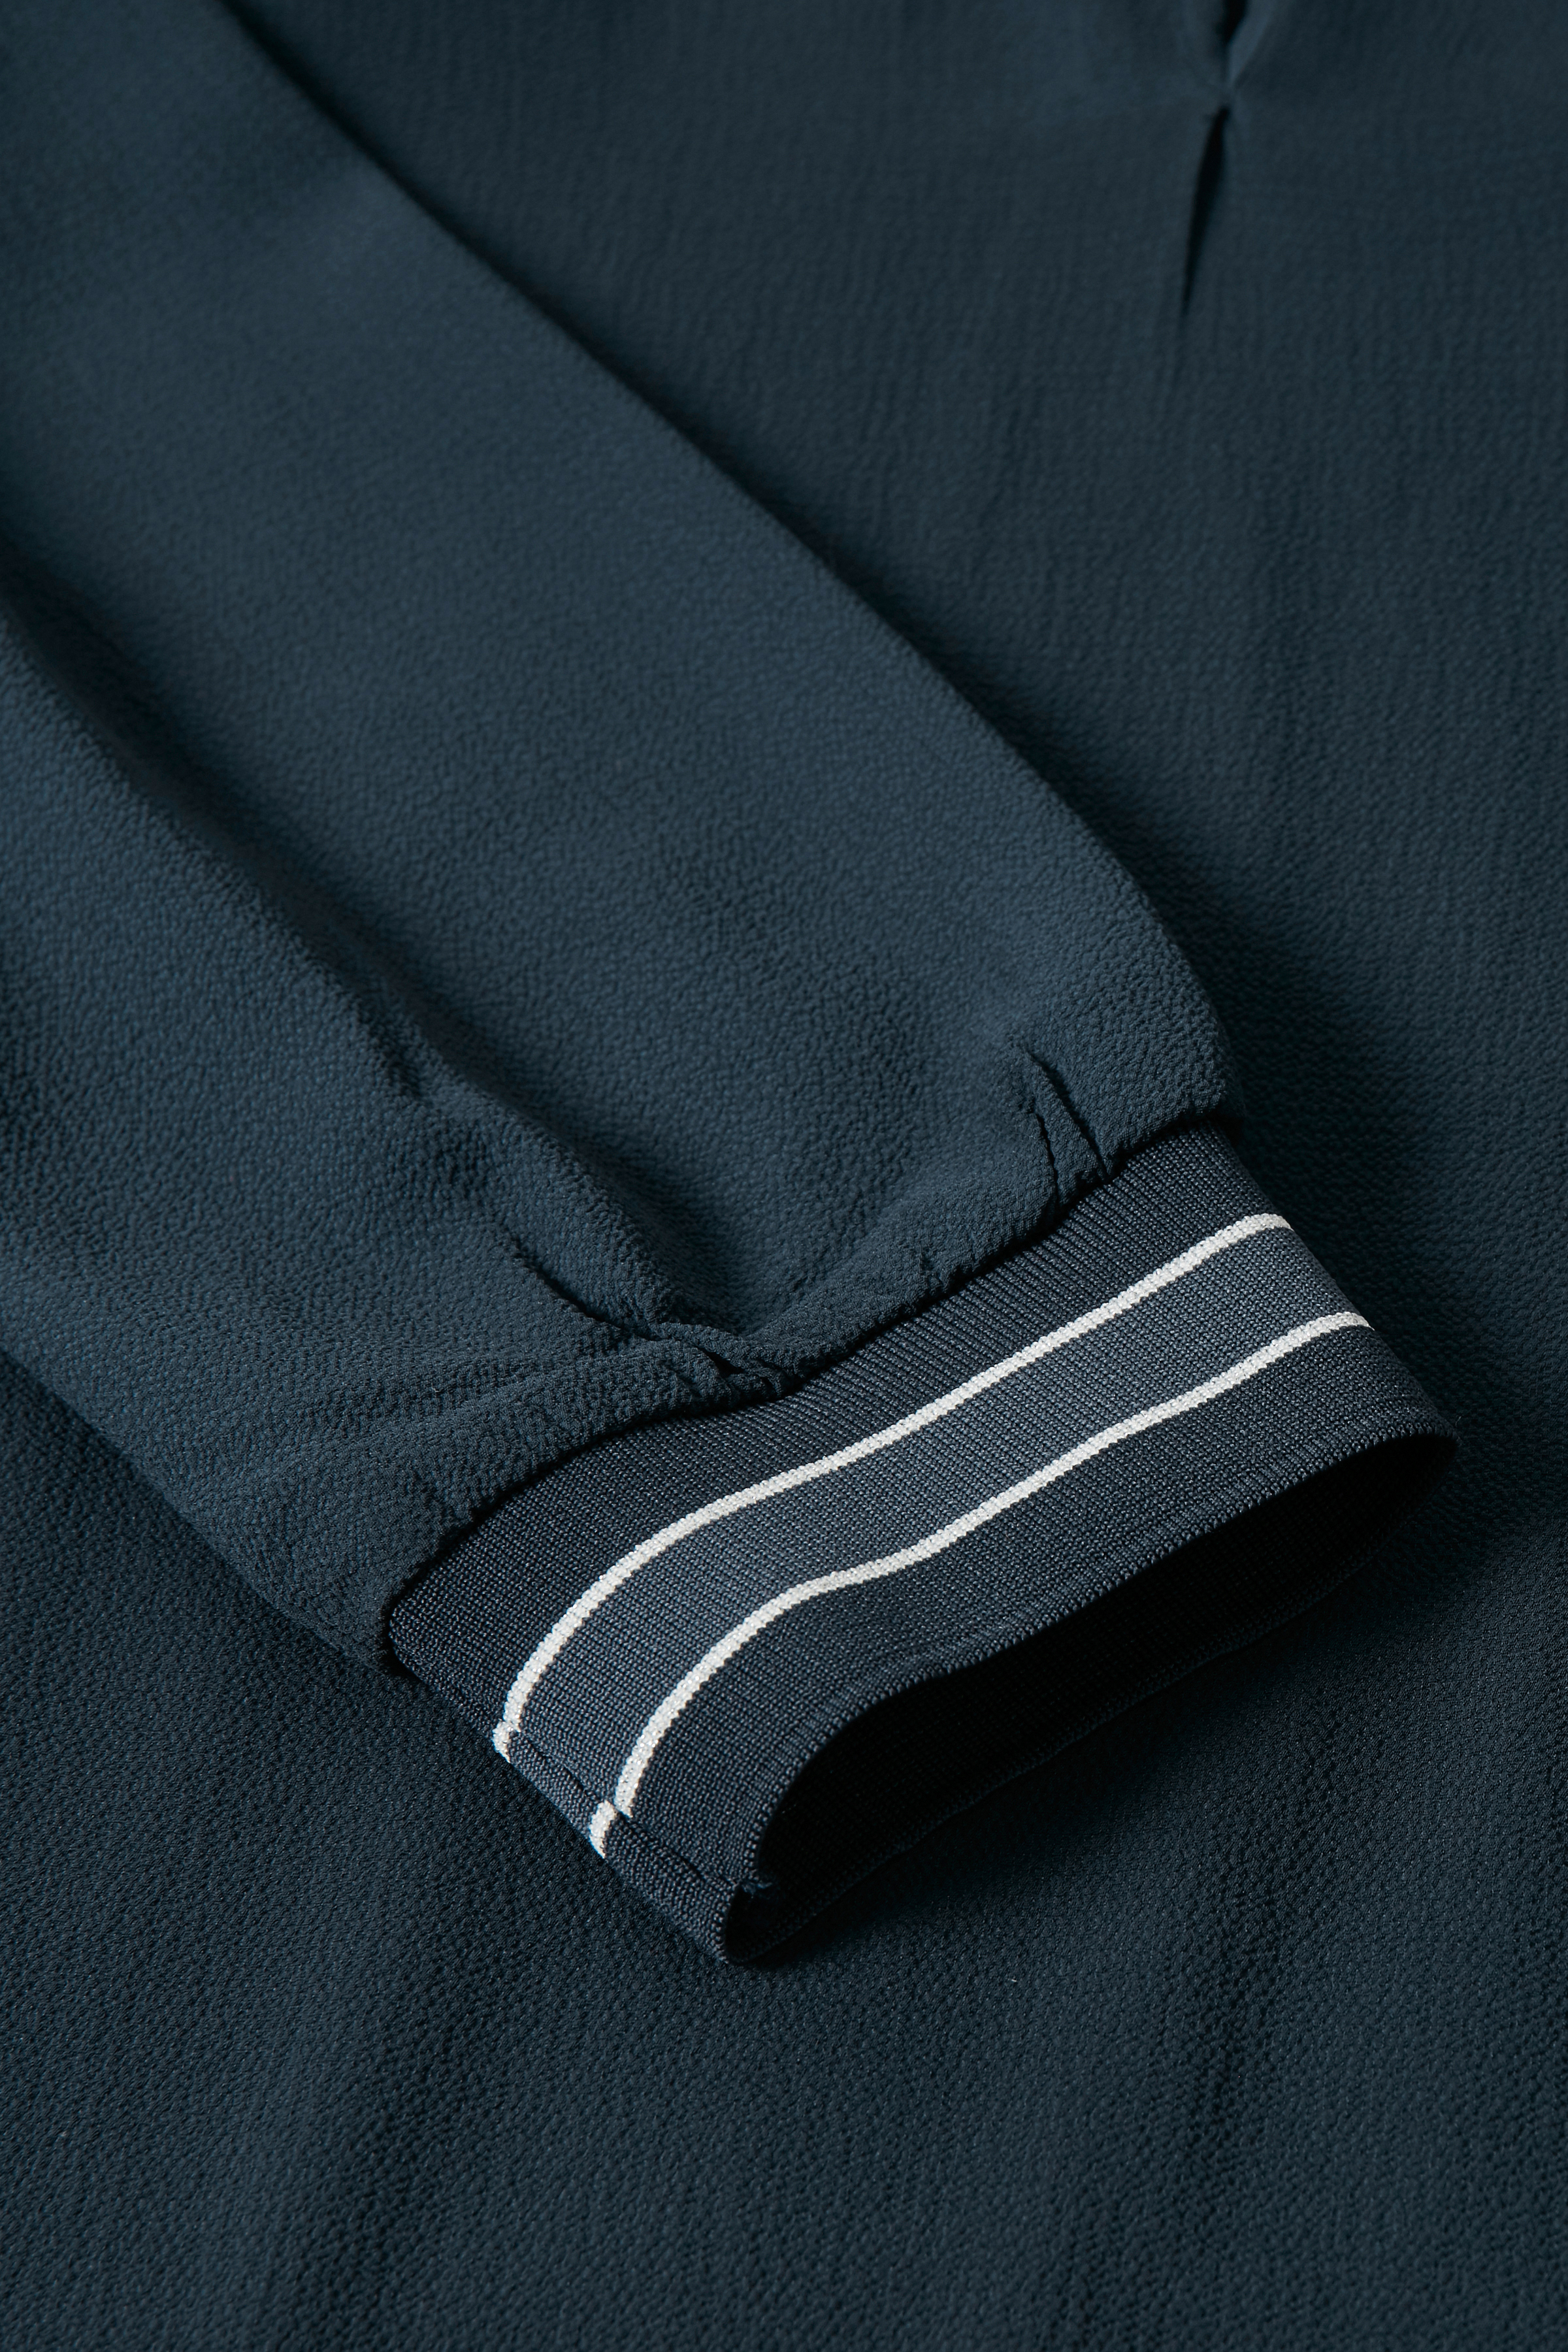 Marineblå Tunika fra Kaffe – Køb Marineblå Tunika fra str. 34-46 her